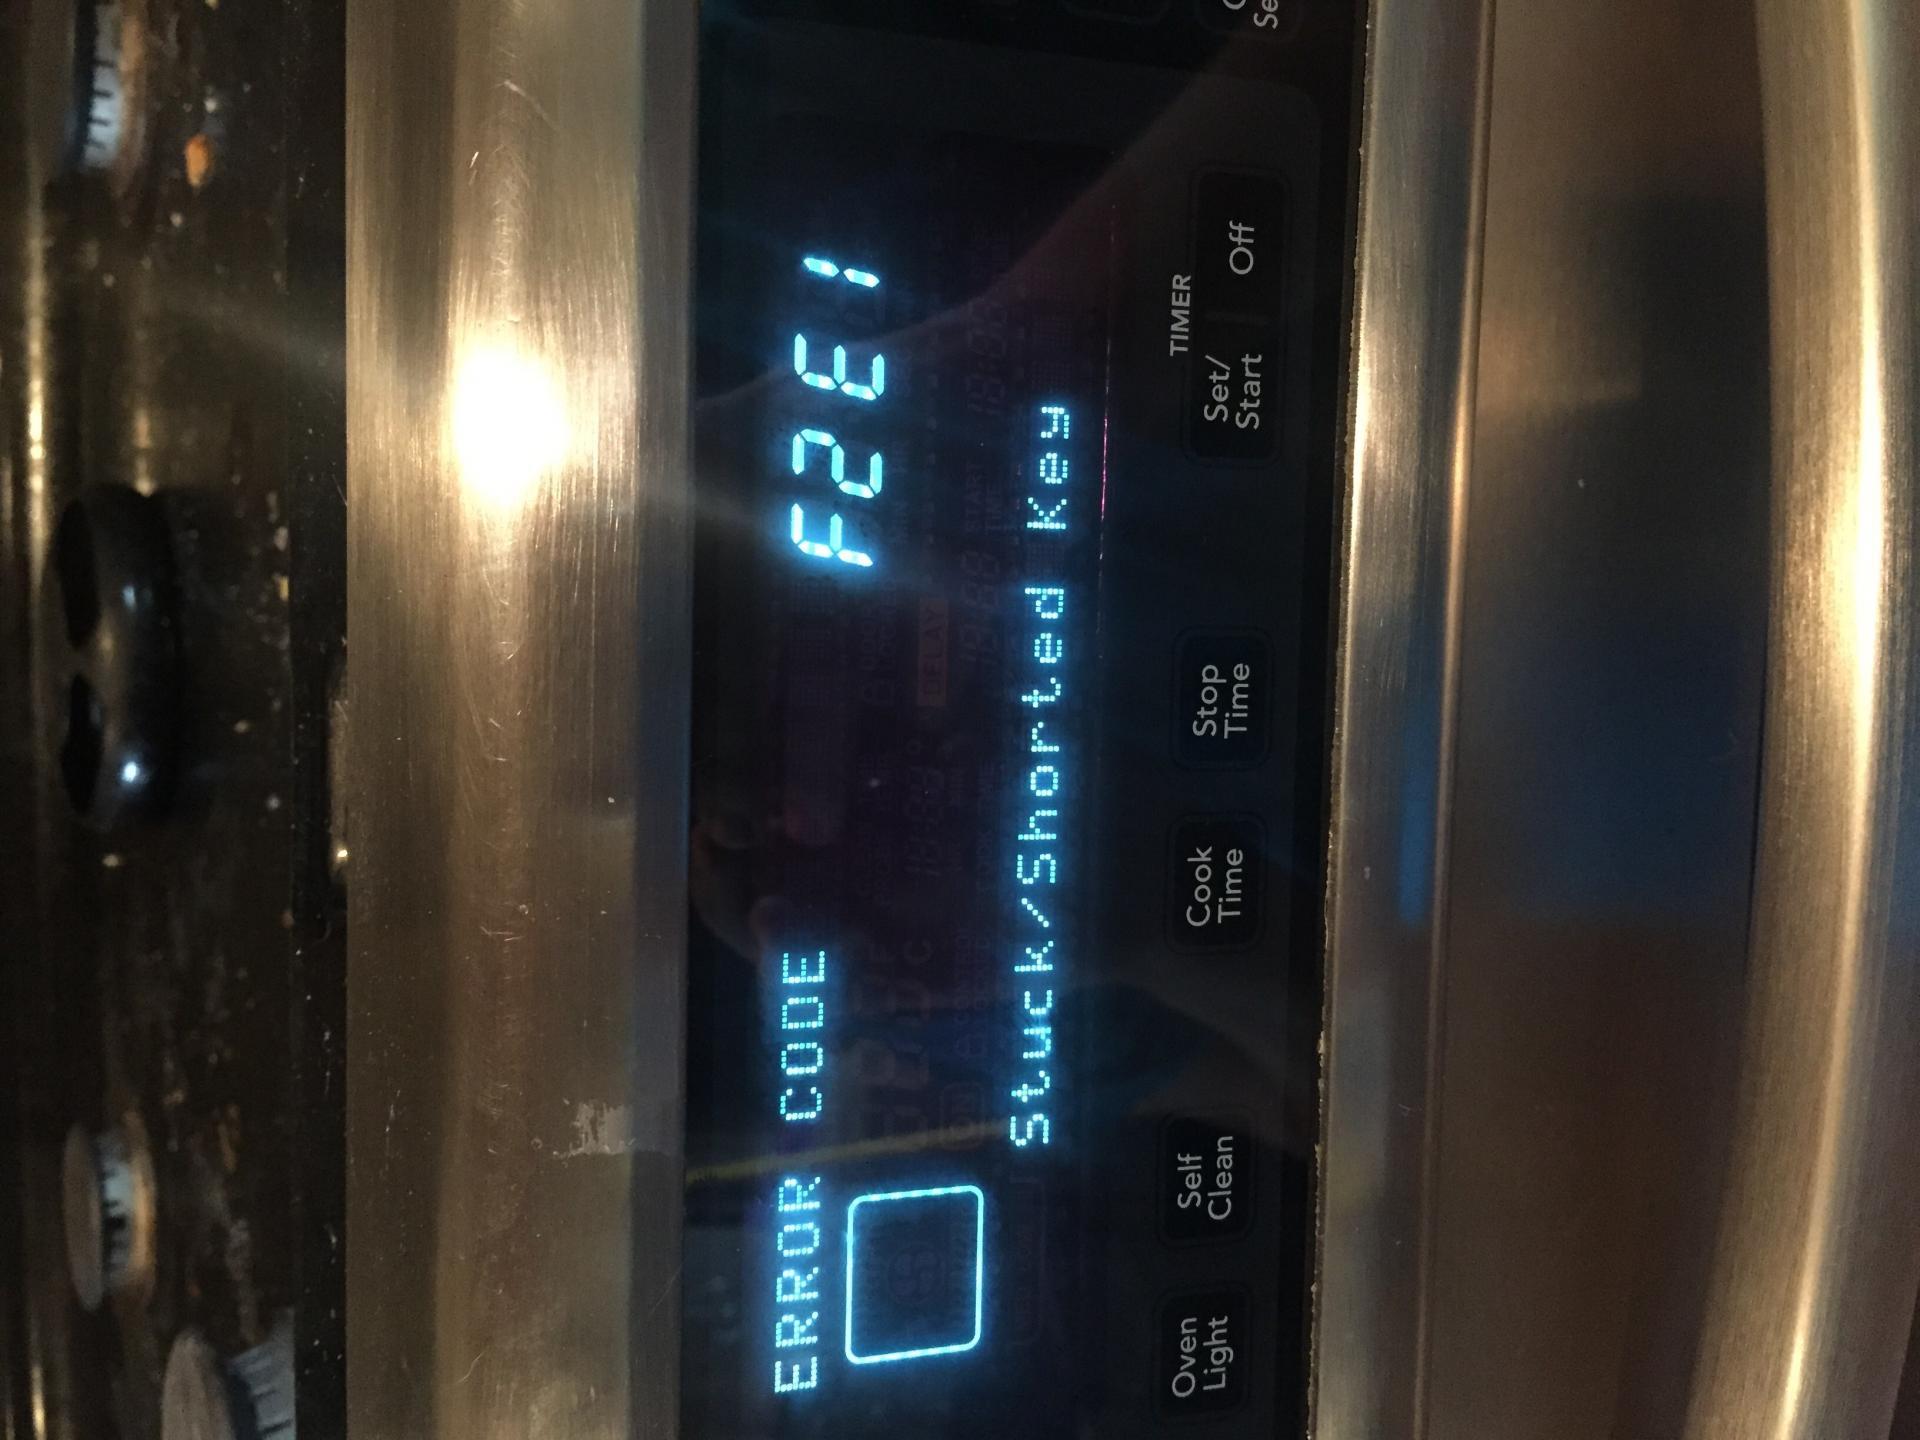 Kitchenaid Superba Oven Broiler Not Working - Kitchen Cabinets